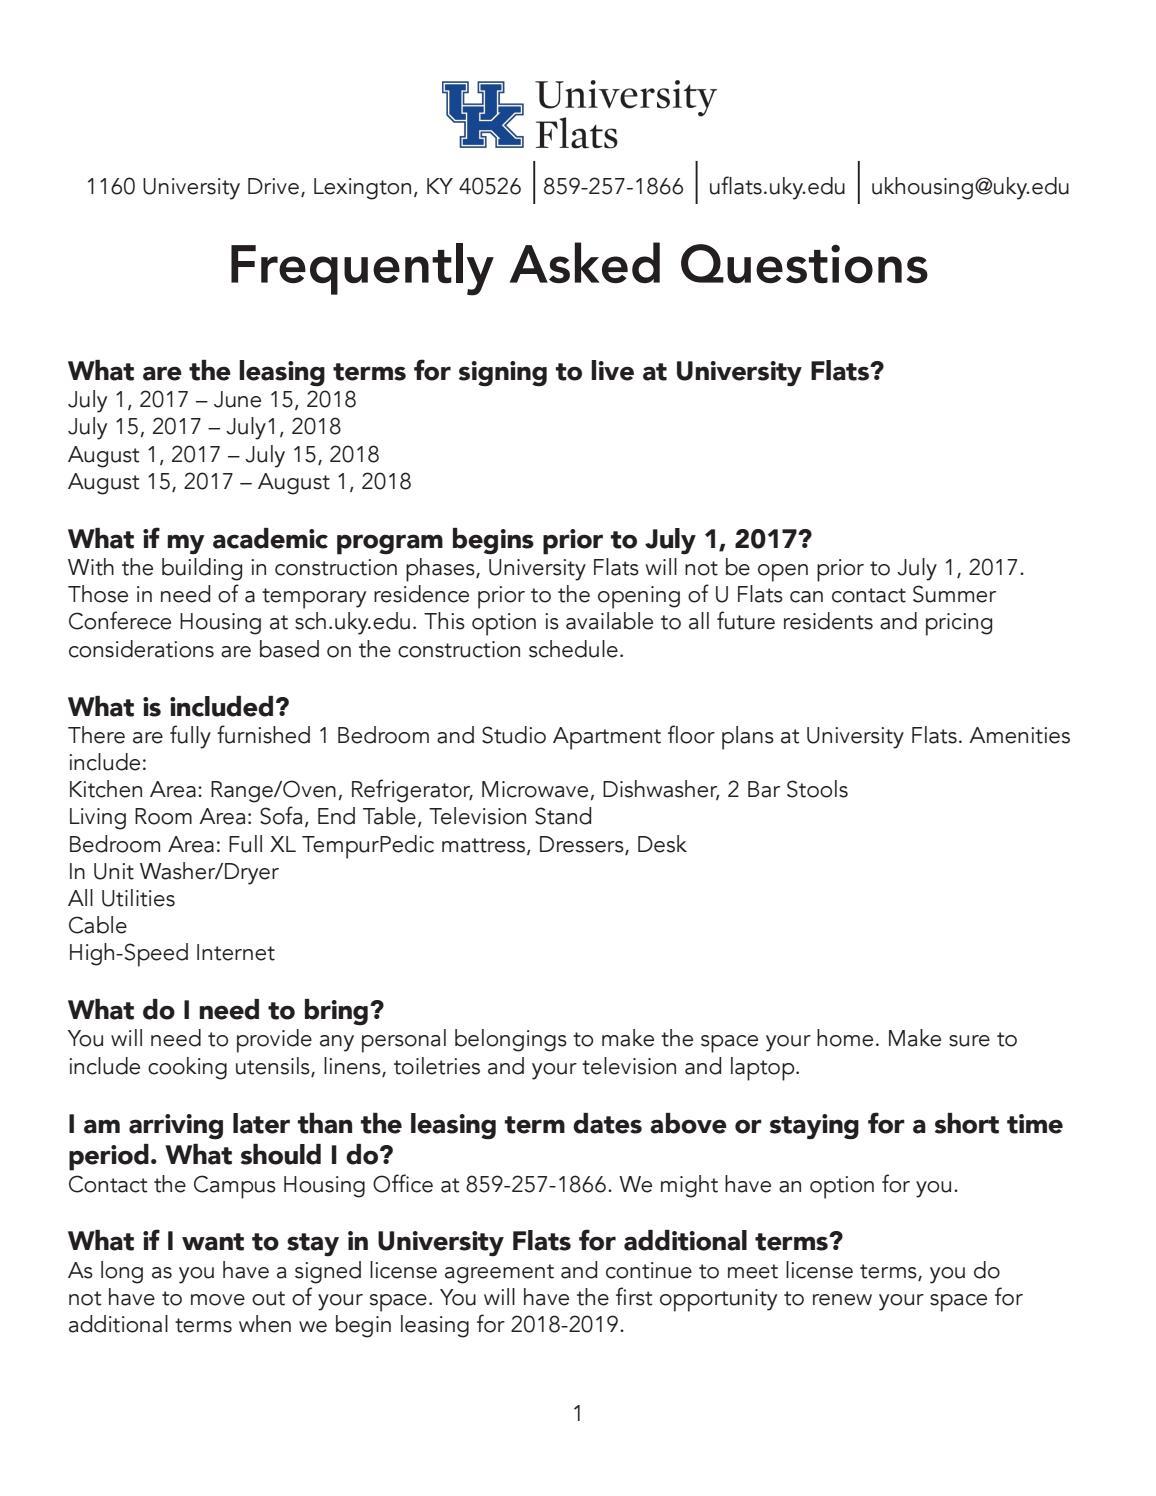 University Flats At The University Of Kentucky Faq By